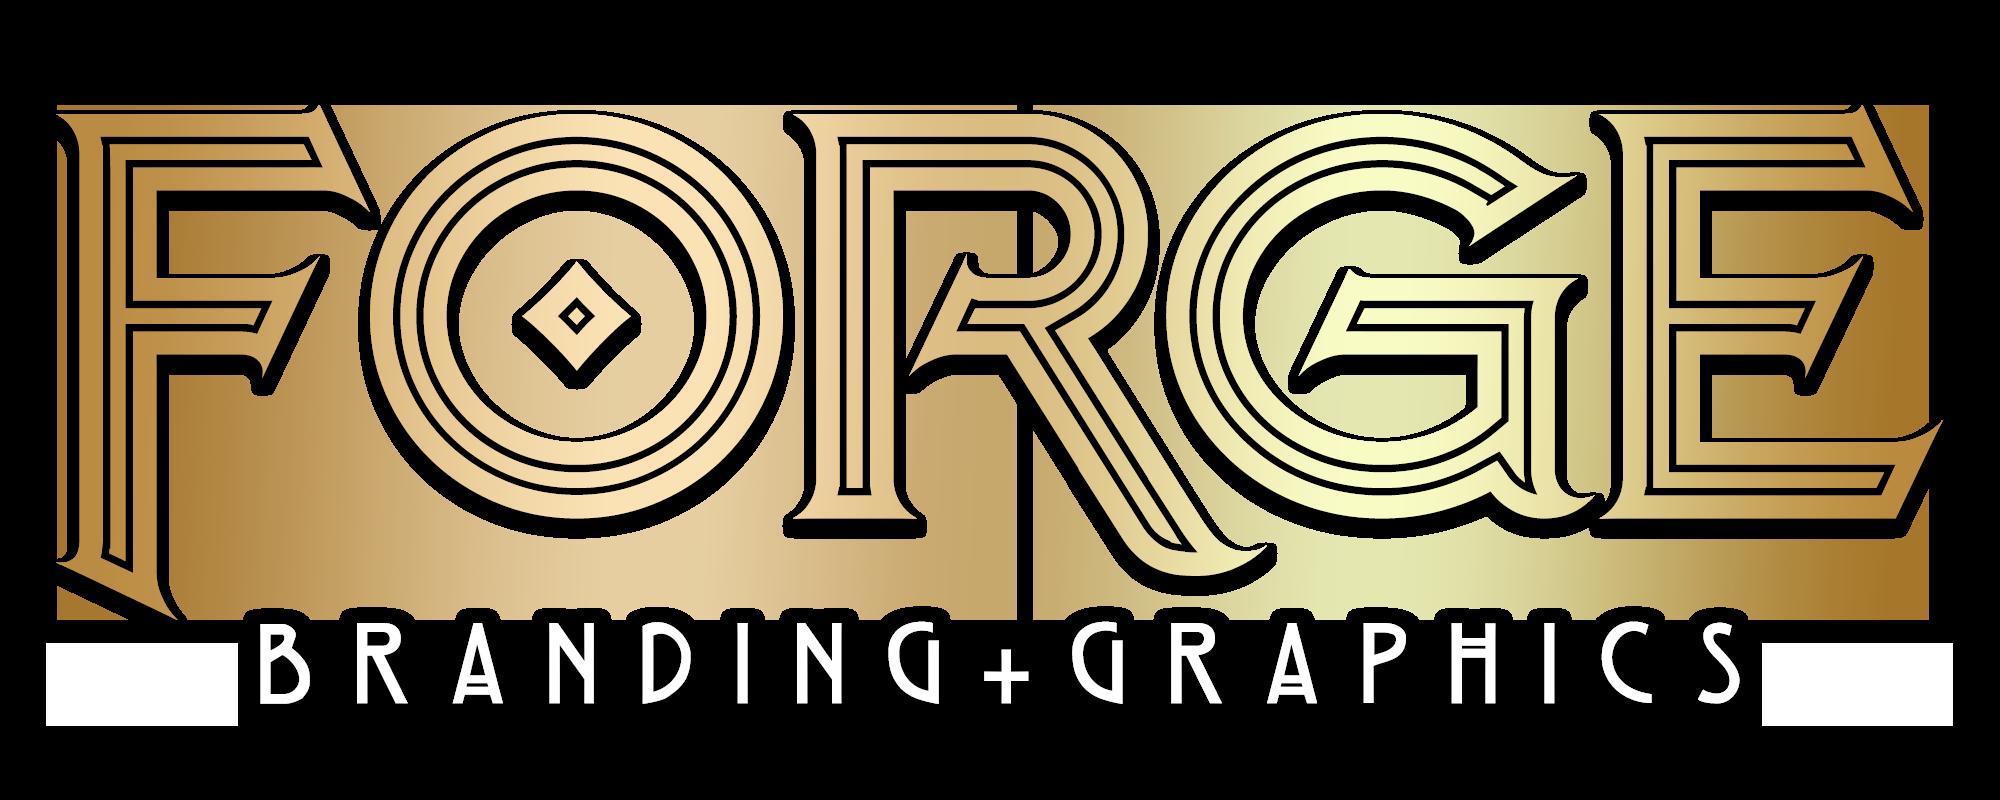 FORGE   Branding + Graphics